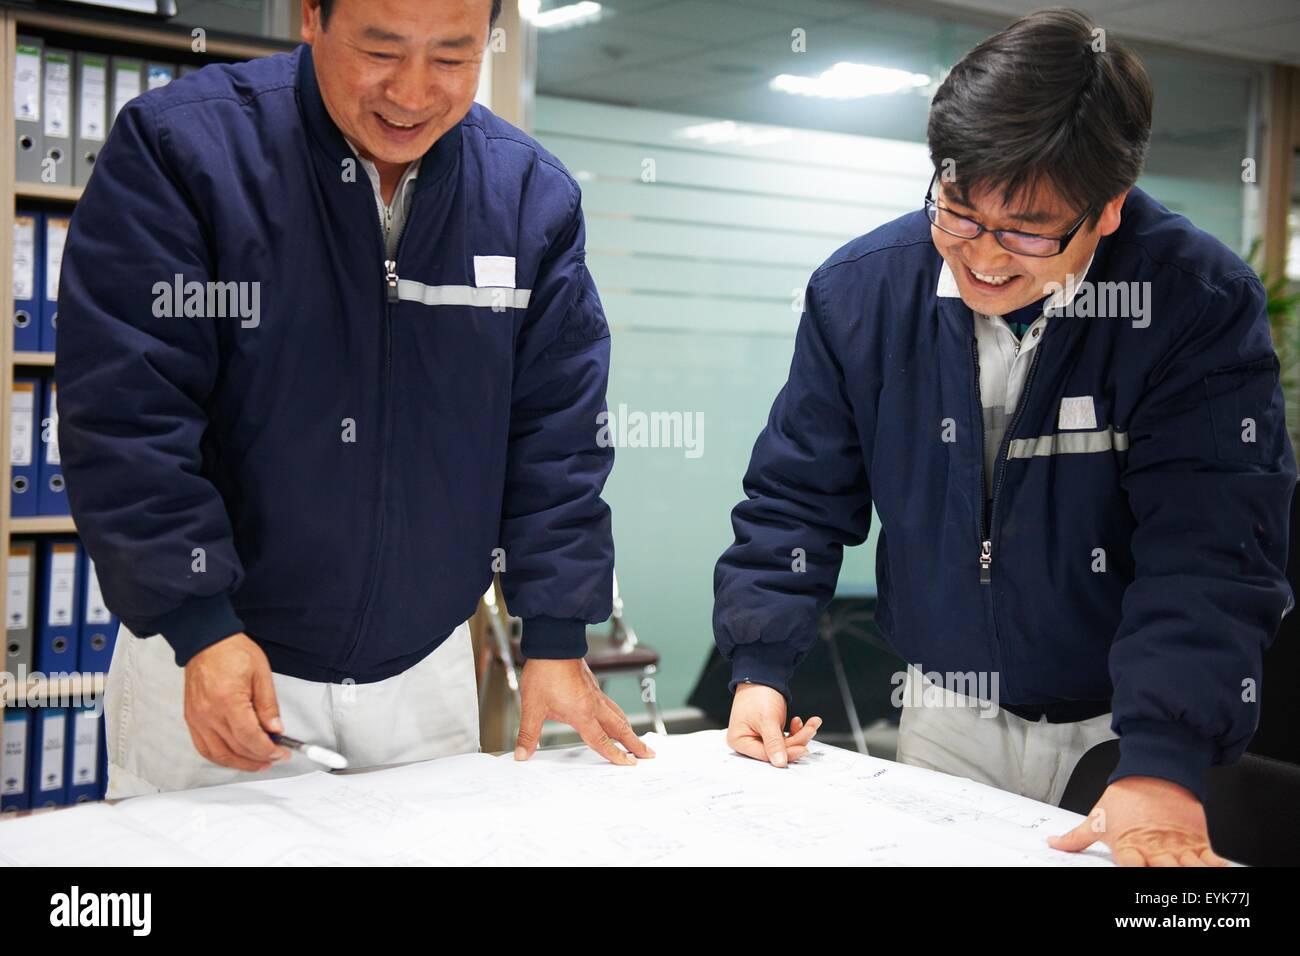 Workers looking at ship plans, GoSeong-gun, South Korea - Stock Image